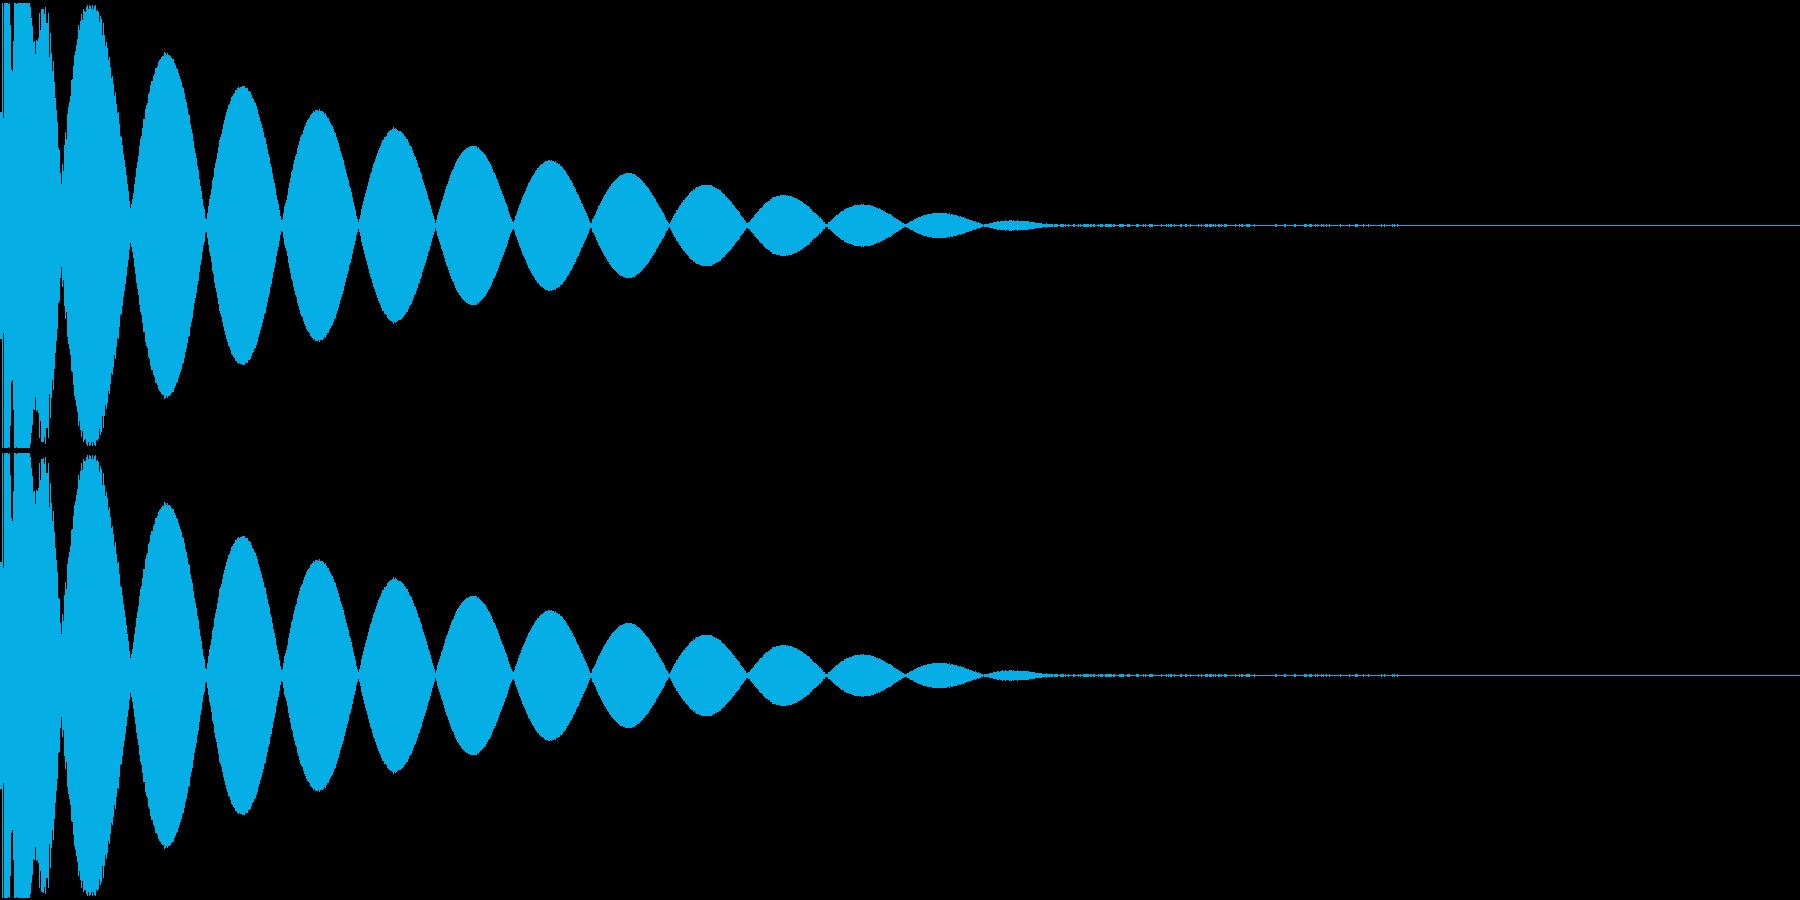 DTM Kick 88 オリジナル音源の再生済みの波形